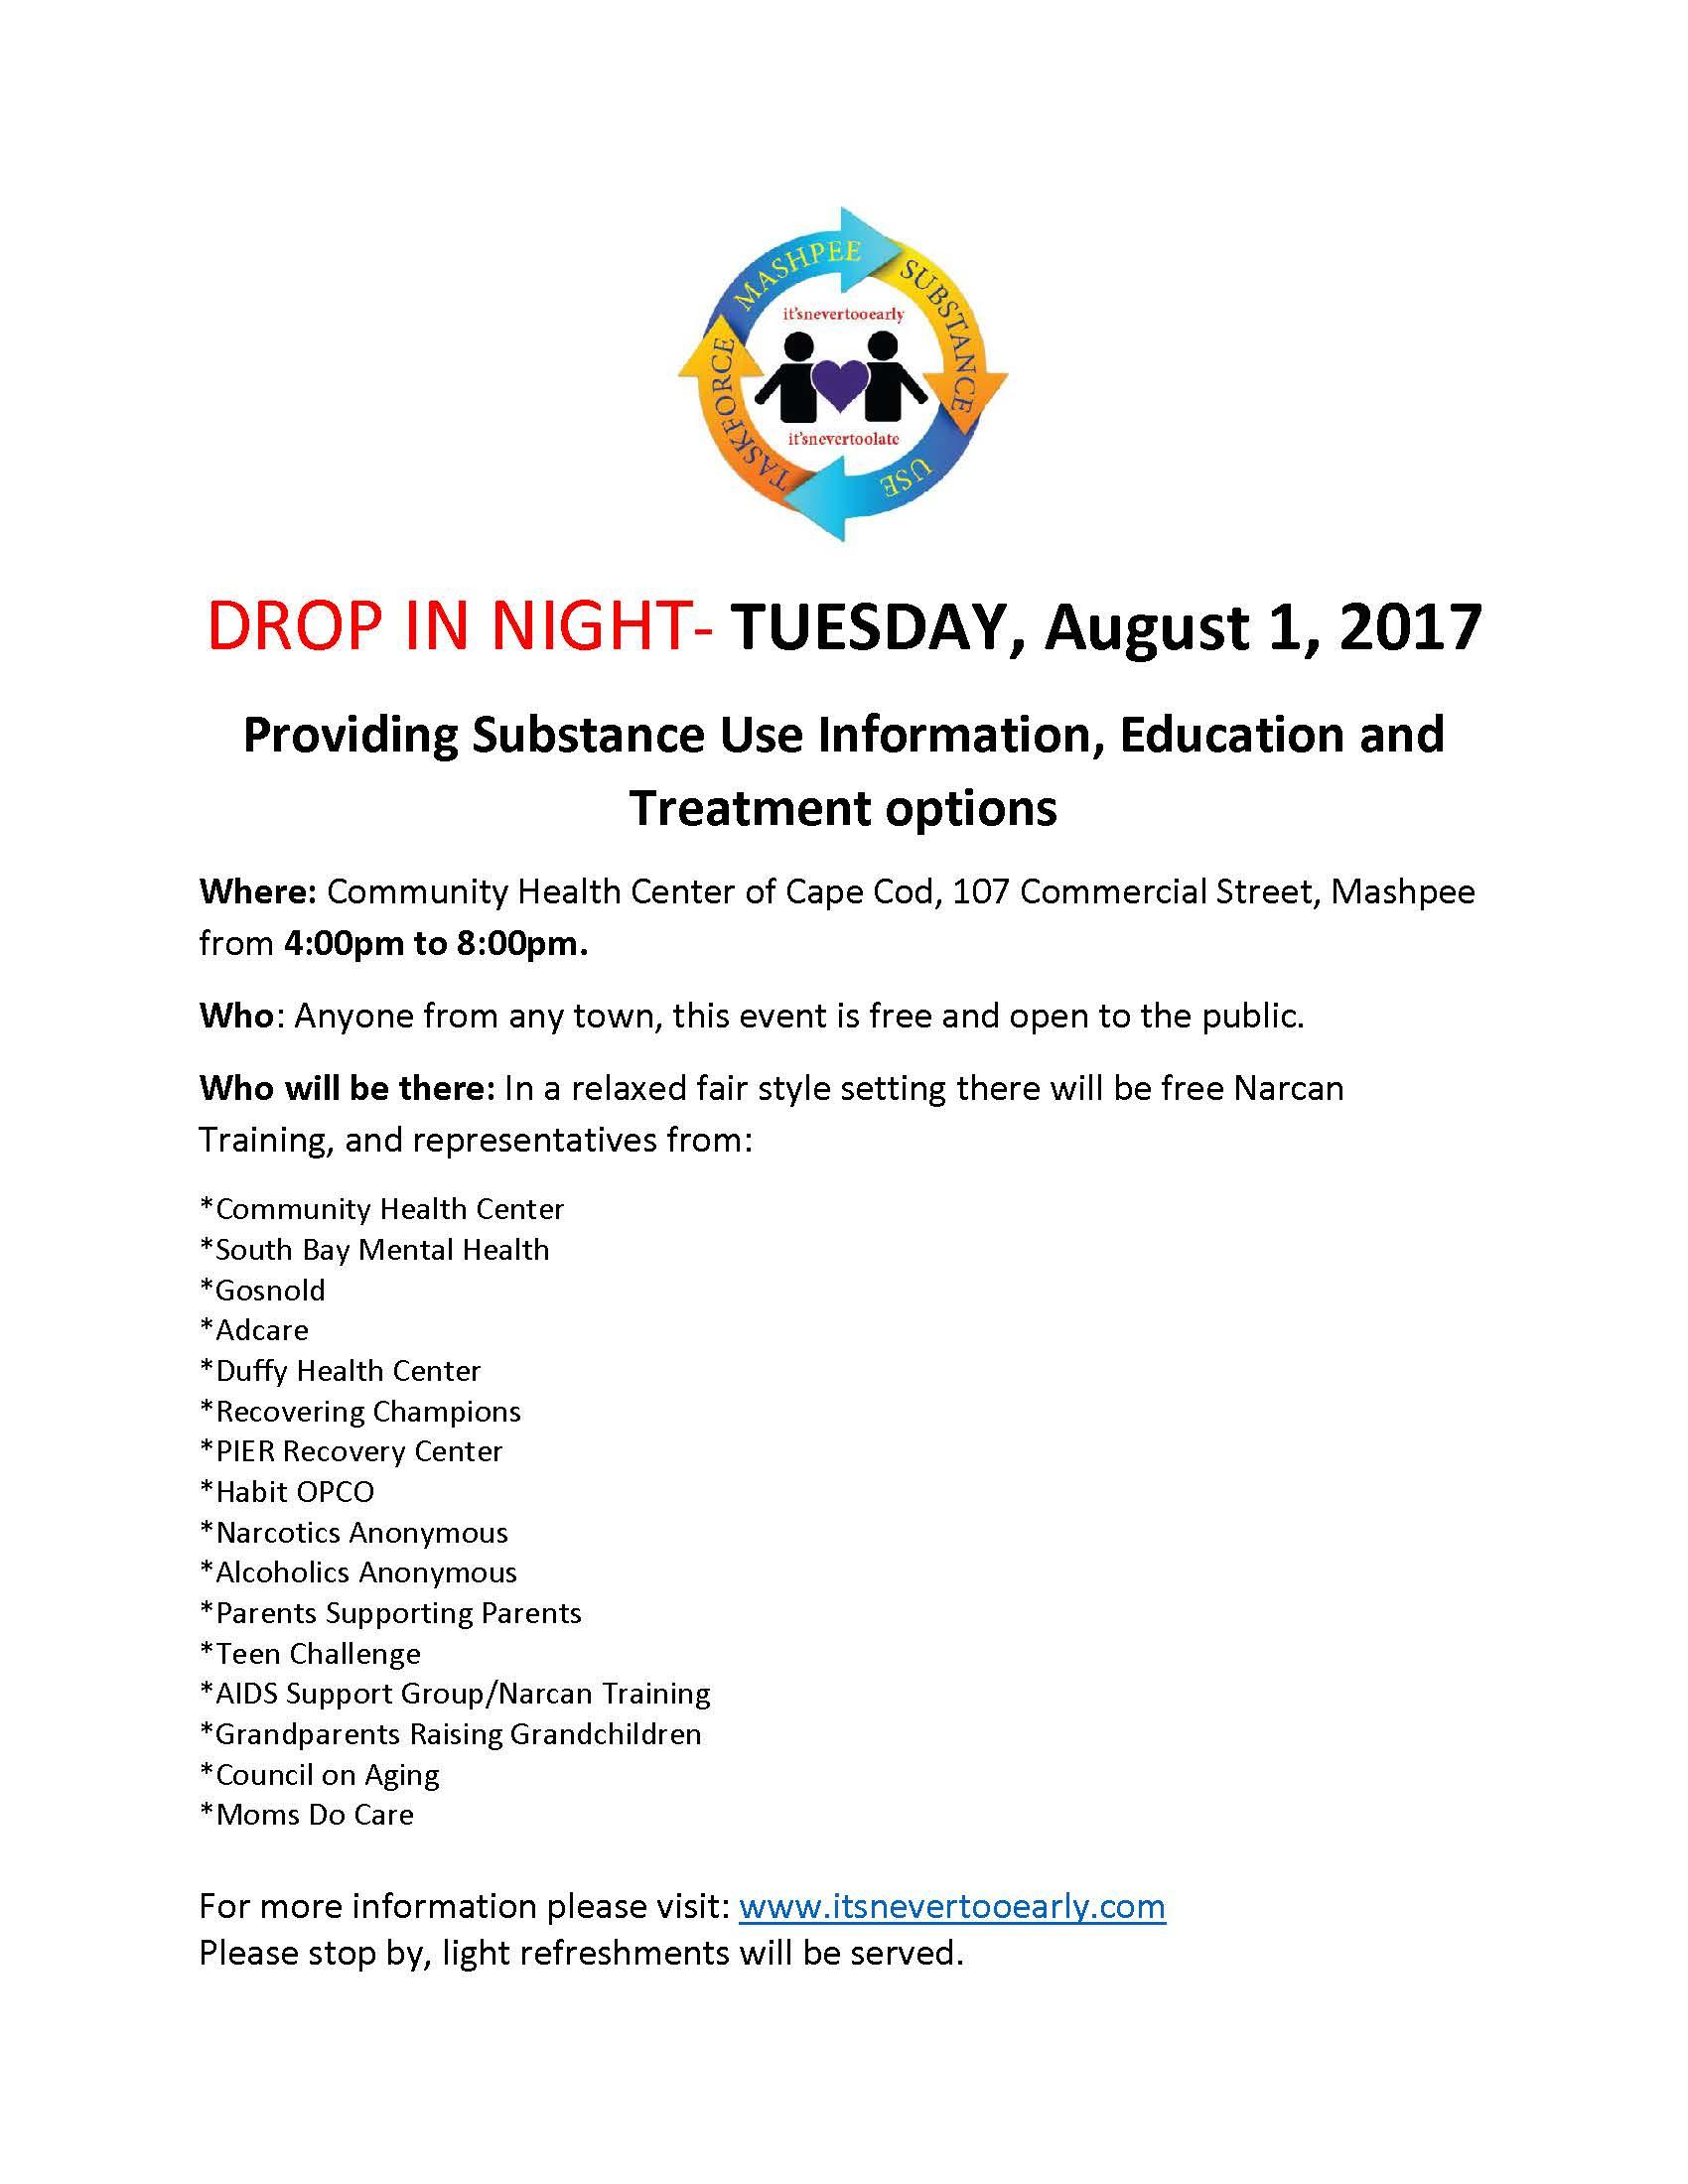 Drop in night information